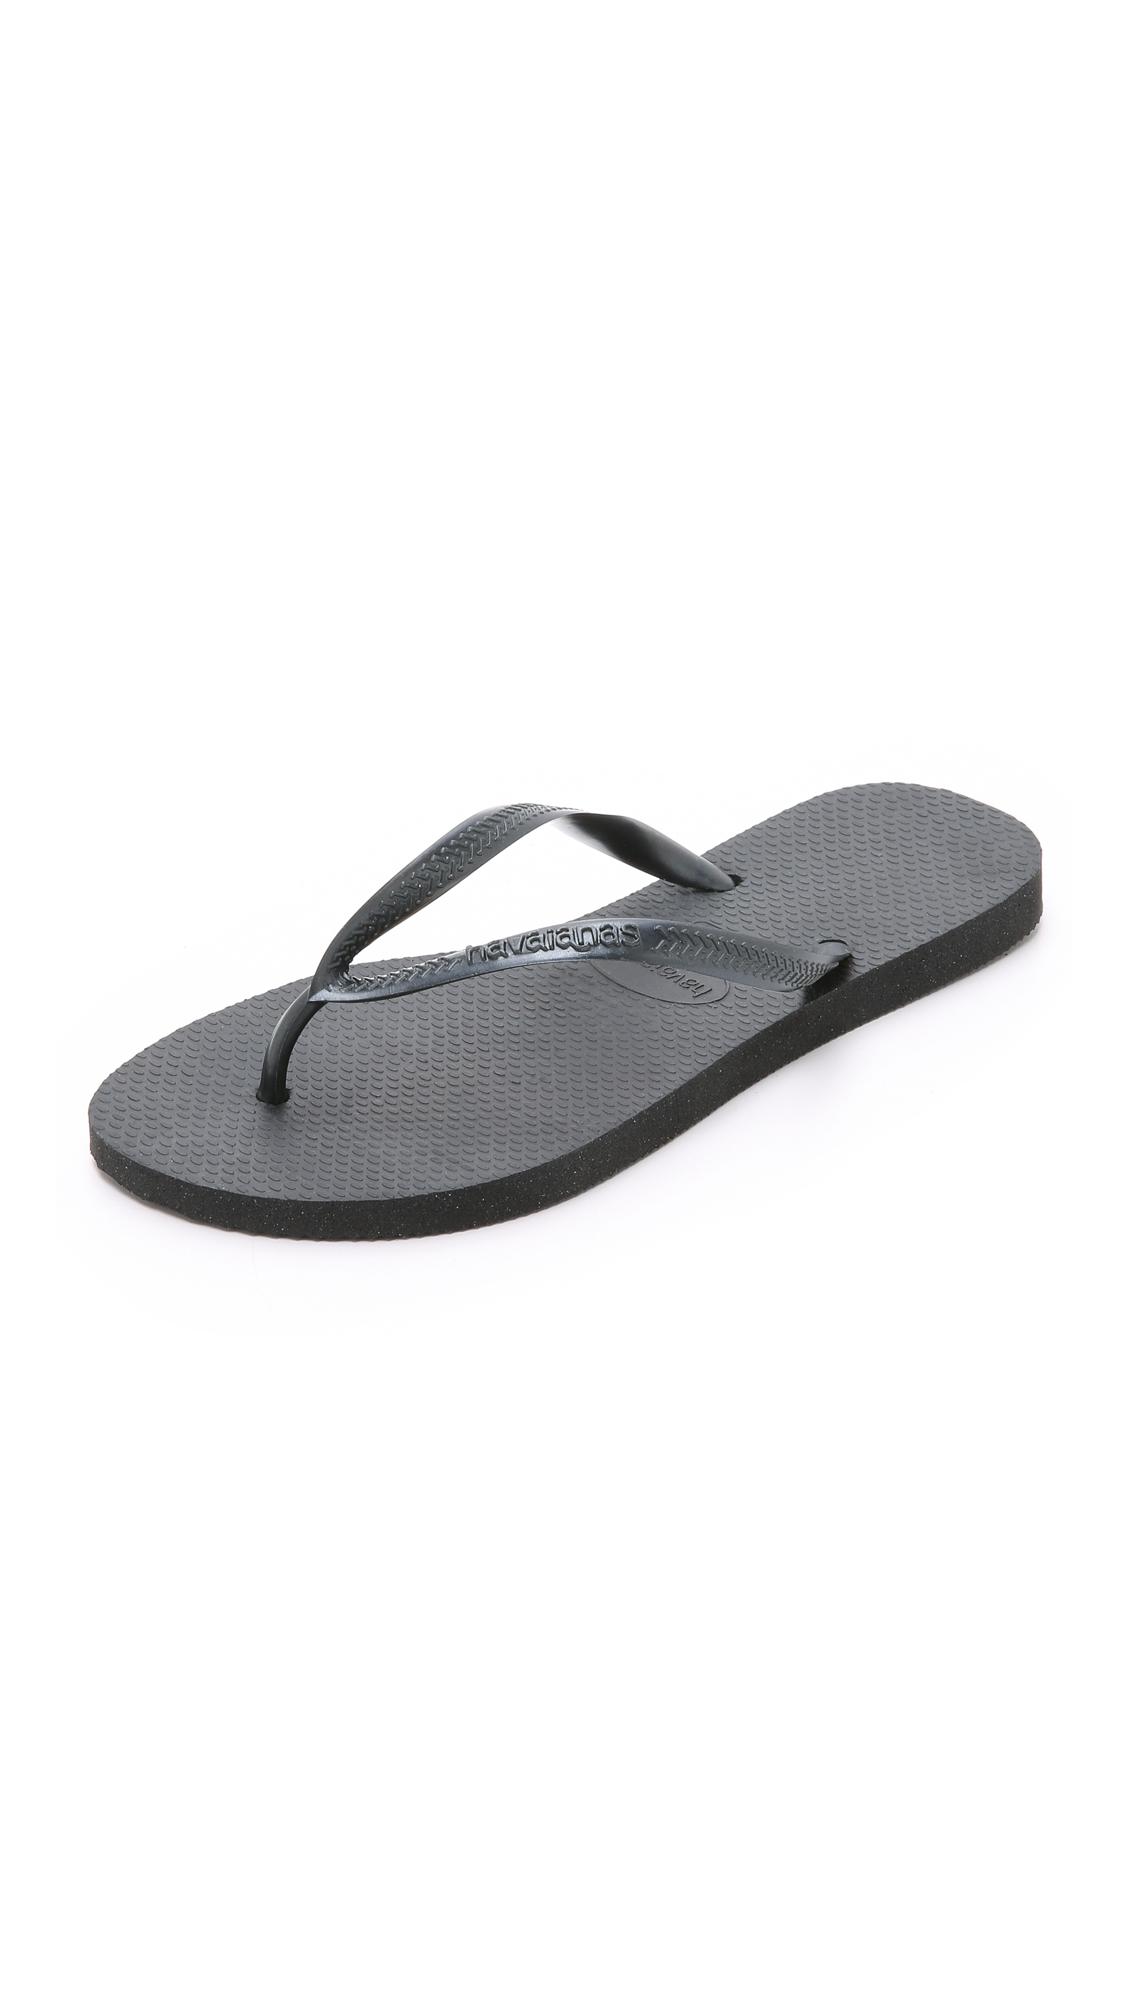 Havaianas Slim Flip Flops - Black at Shopbop